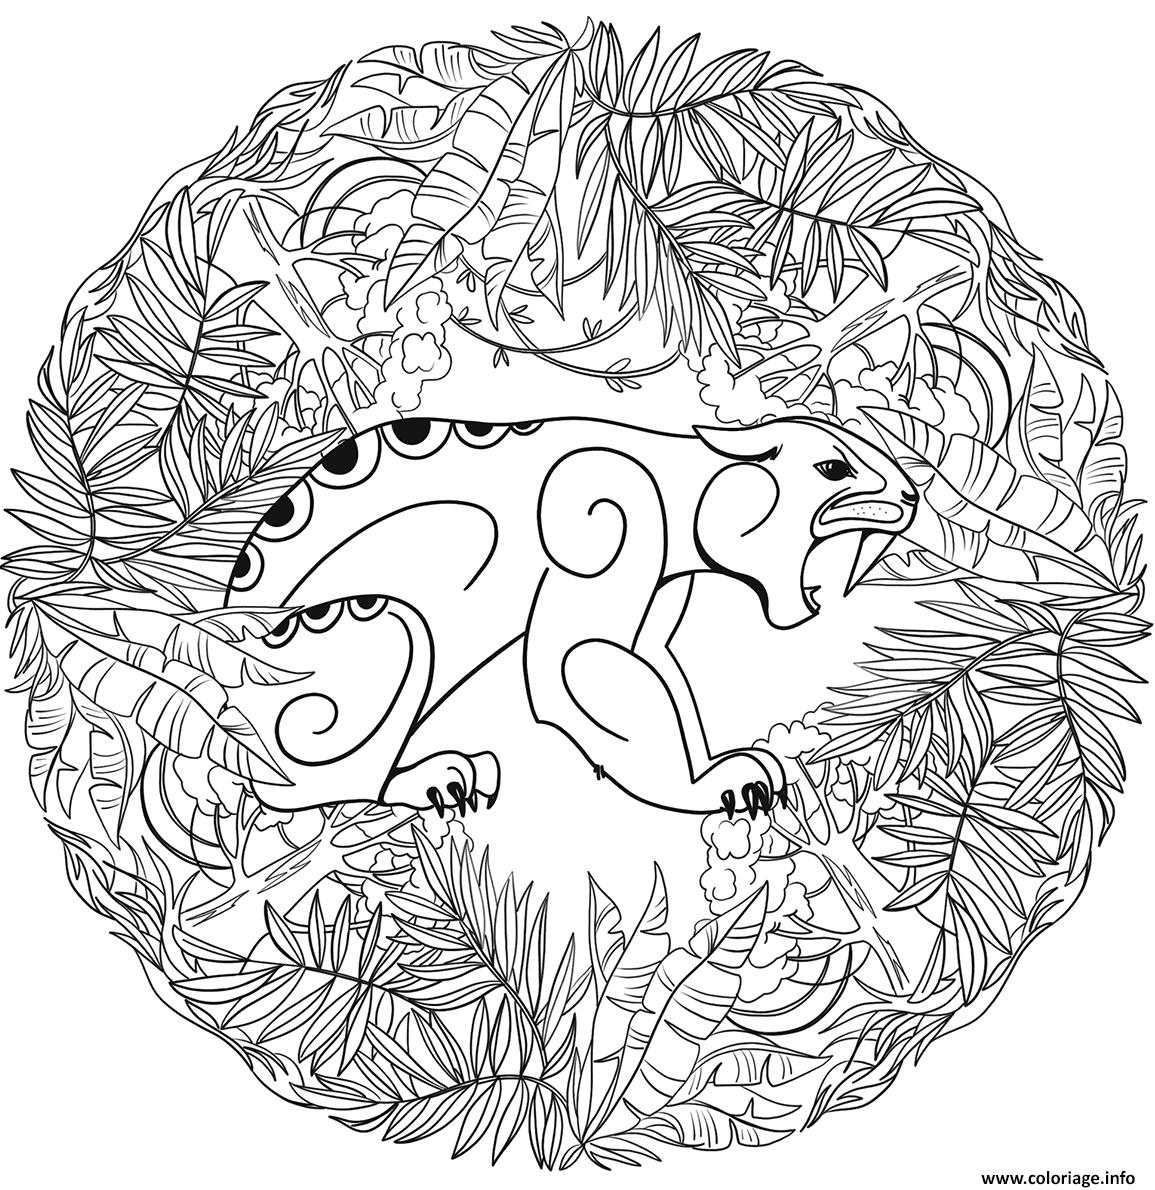 Coloriage Jaguar Mandala Par Lesya Adamchuk Dessin Mandala Animaux A Imprimer